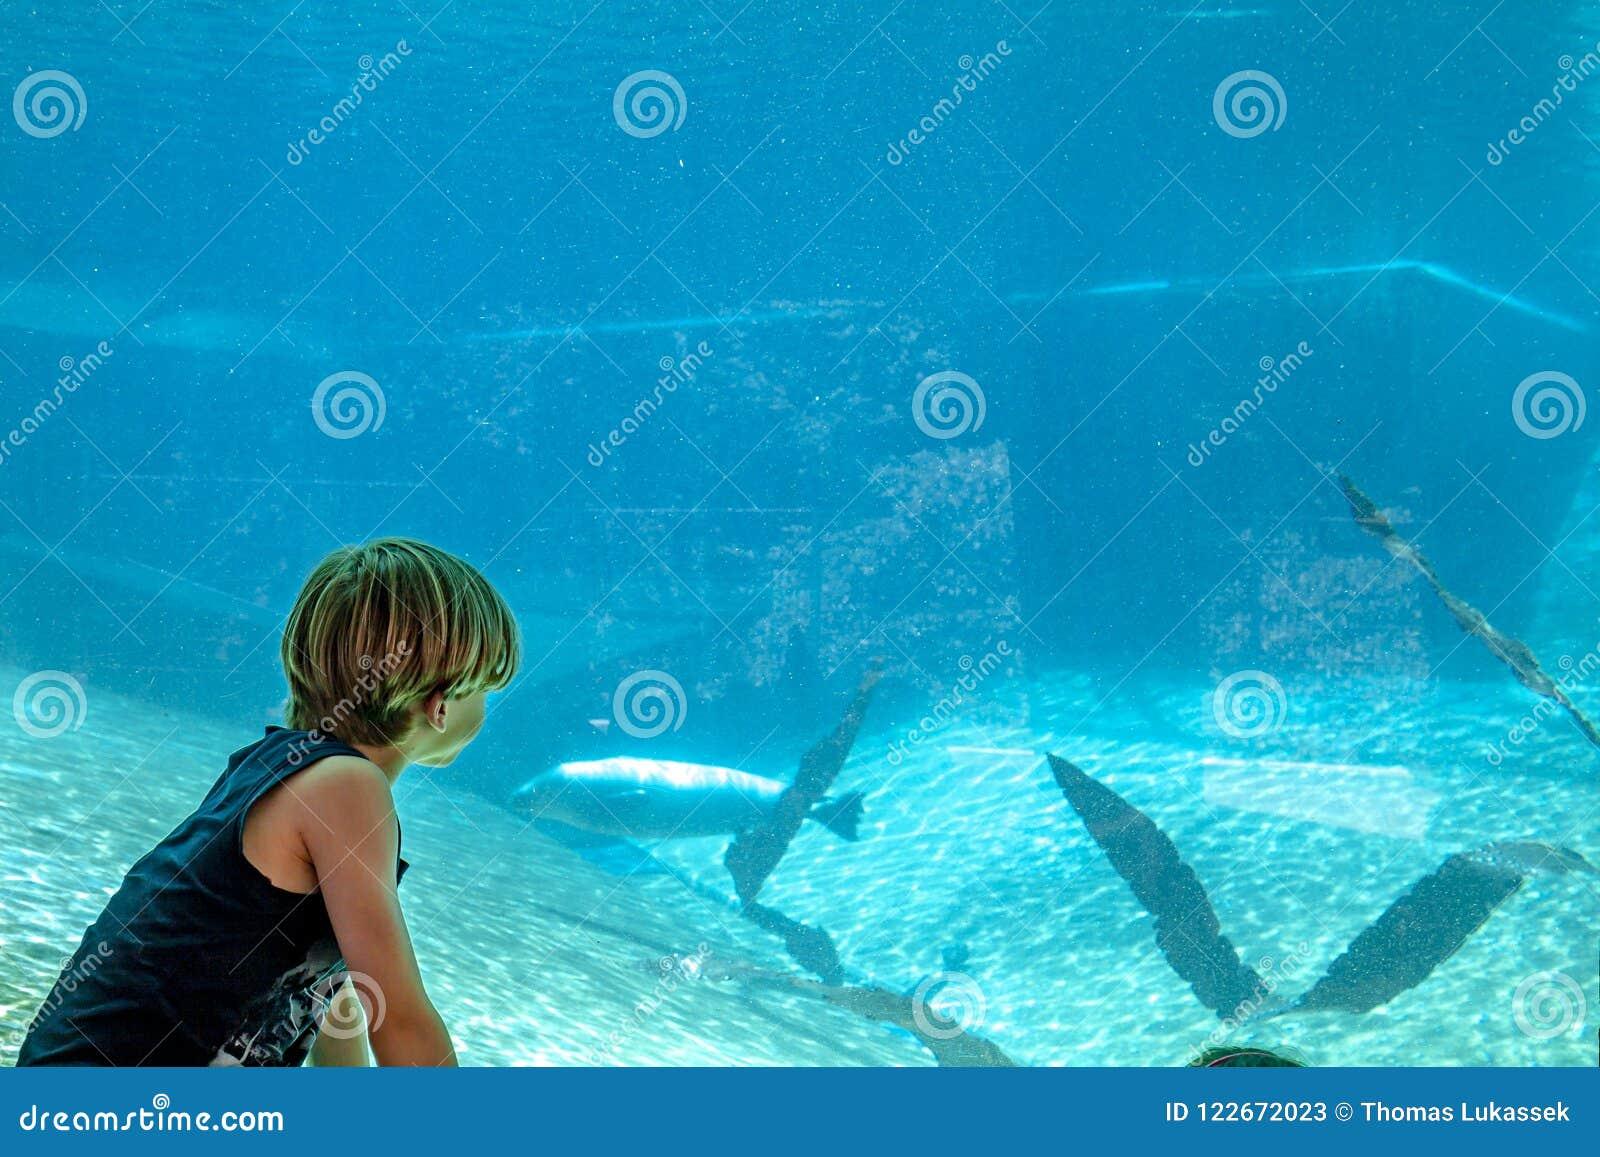 Silhouette d un garçon regardant aeal dans l aquarium